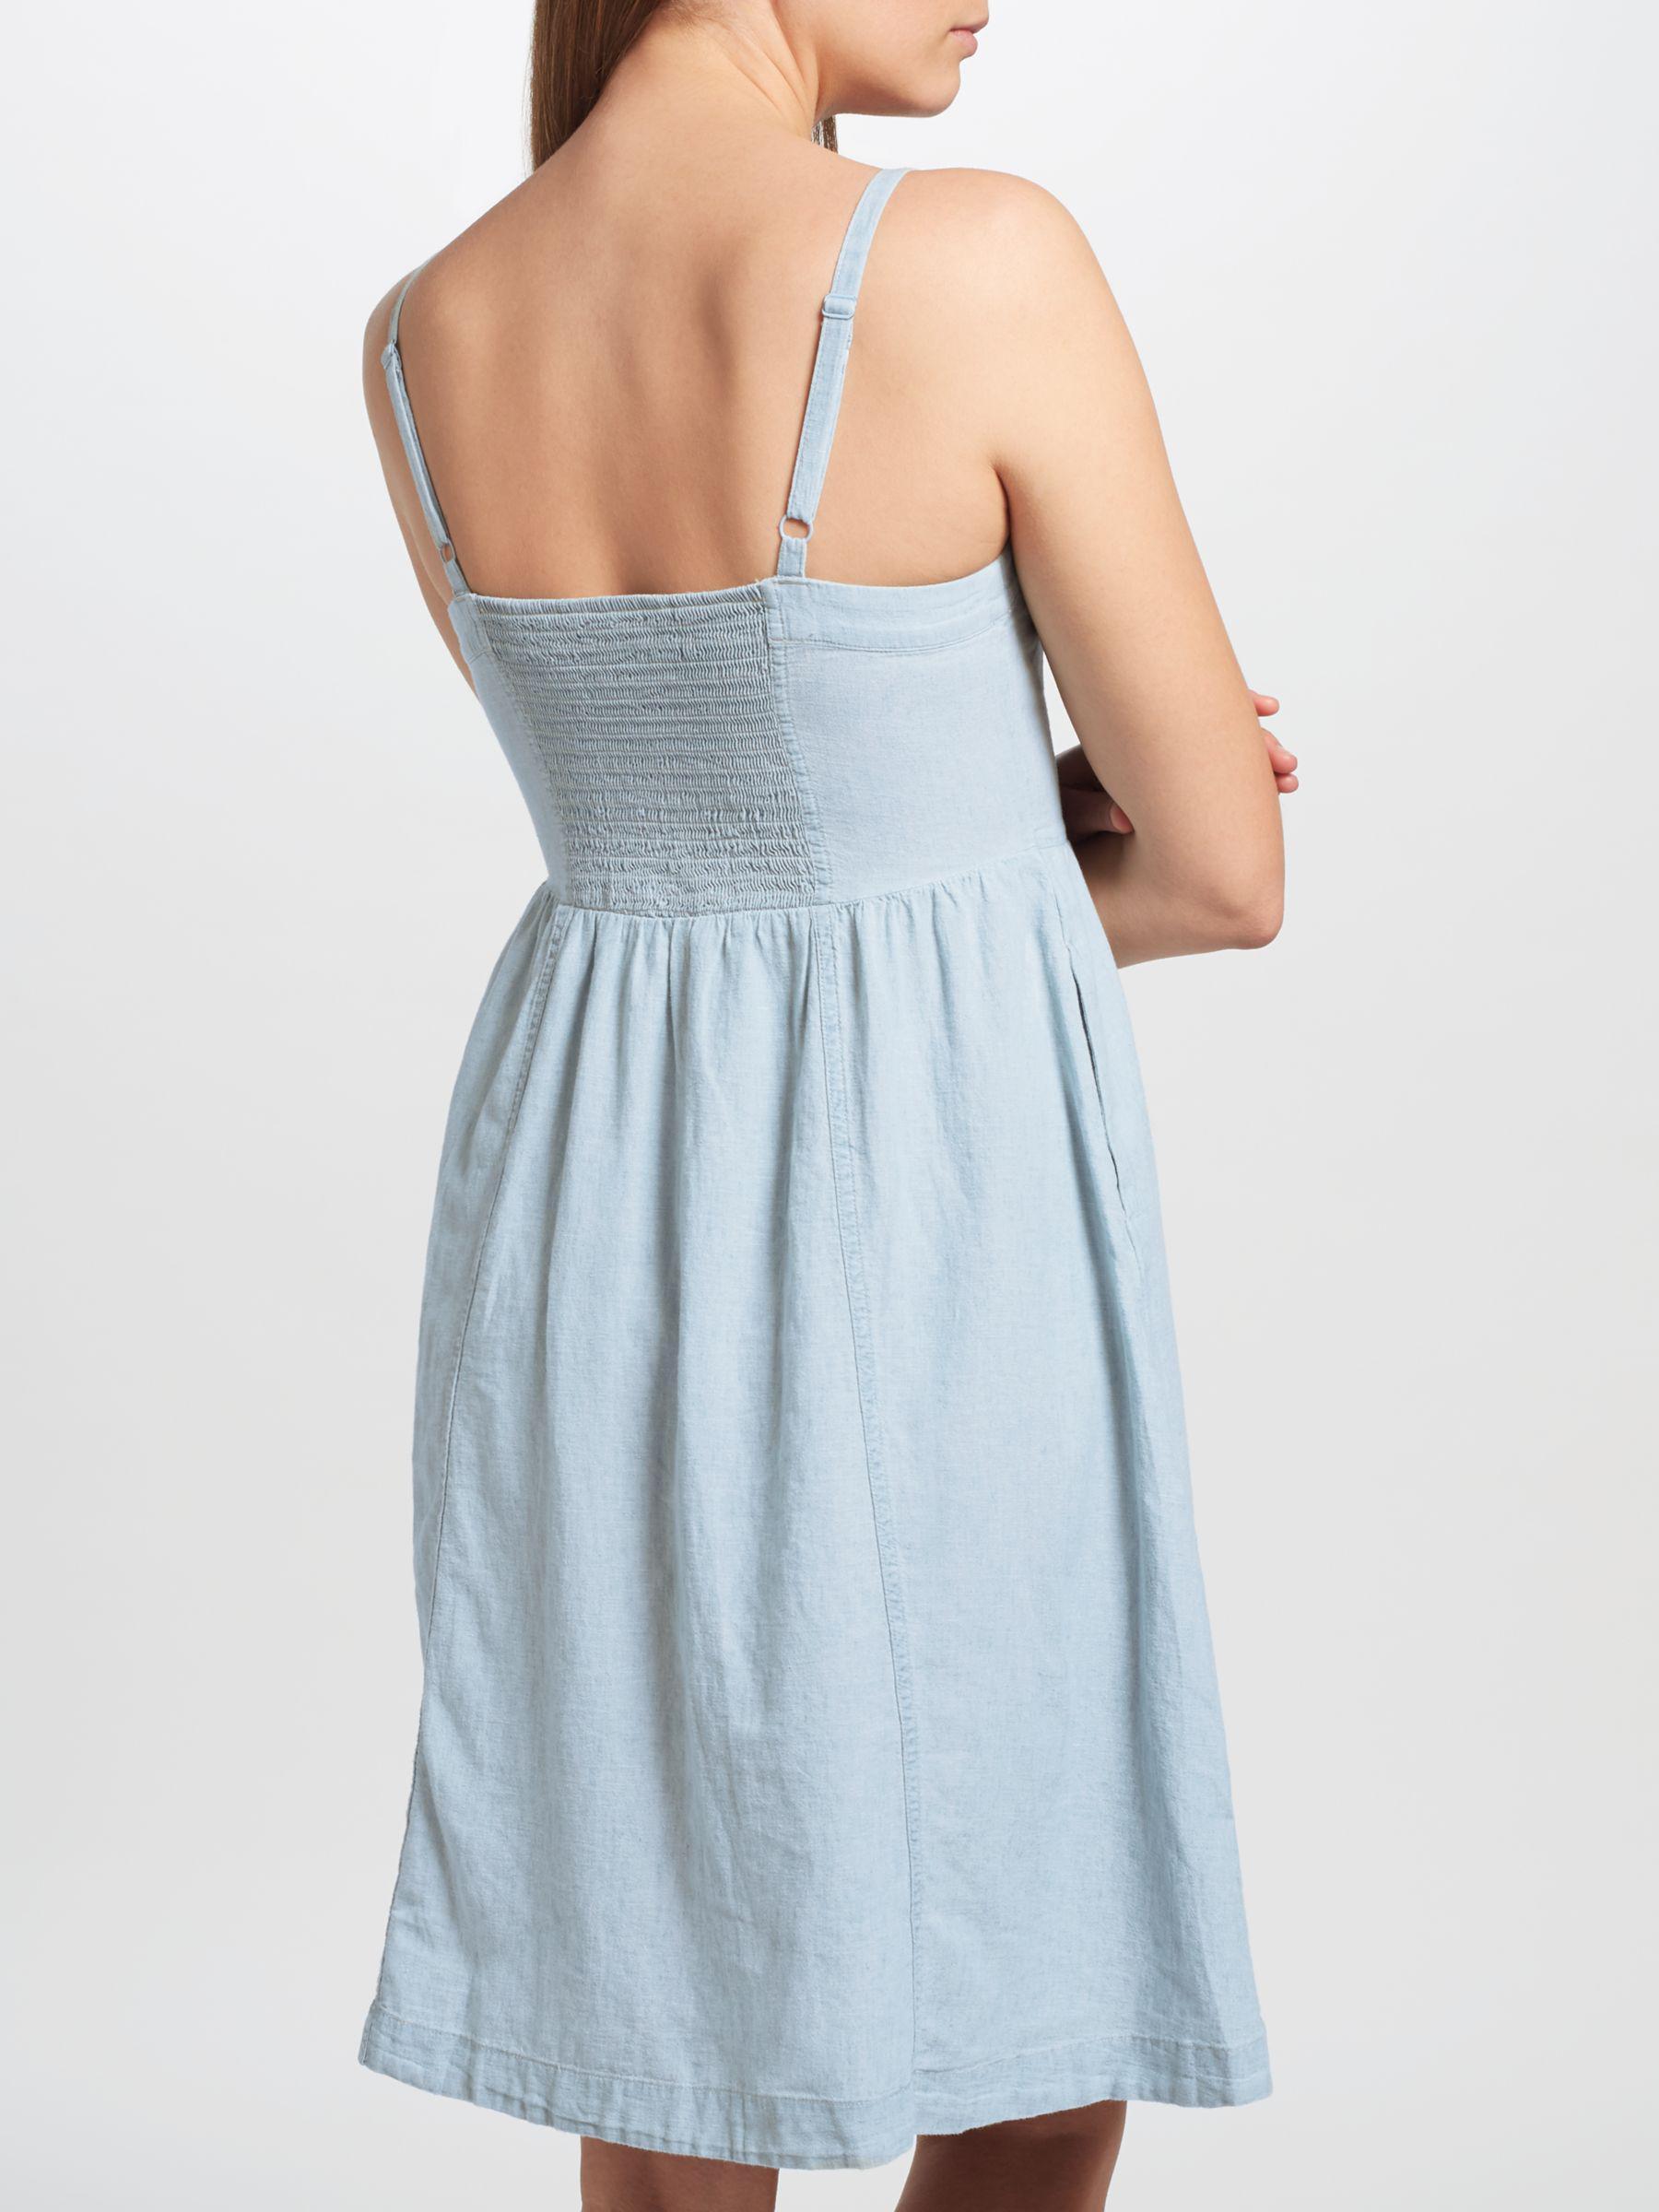 Best John Lewis Wedding Outfits Gallery - Wedding Ideas - memiocall.com